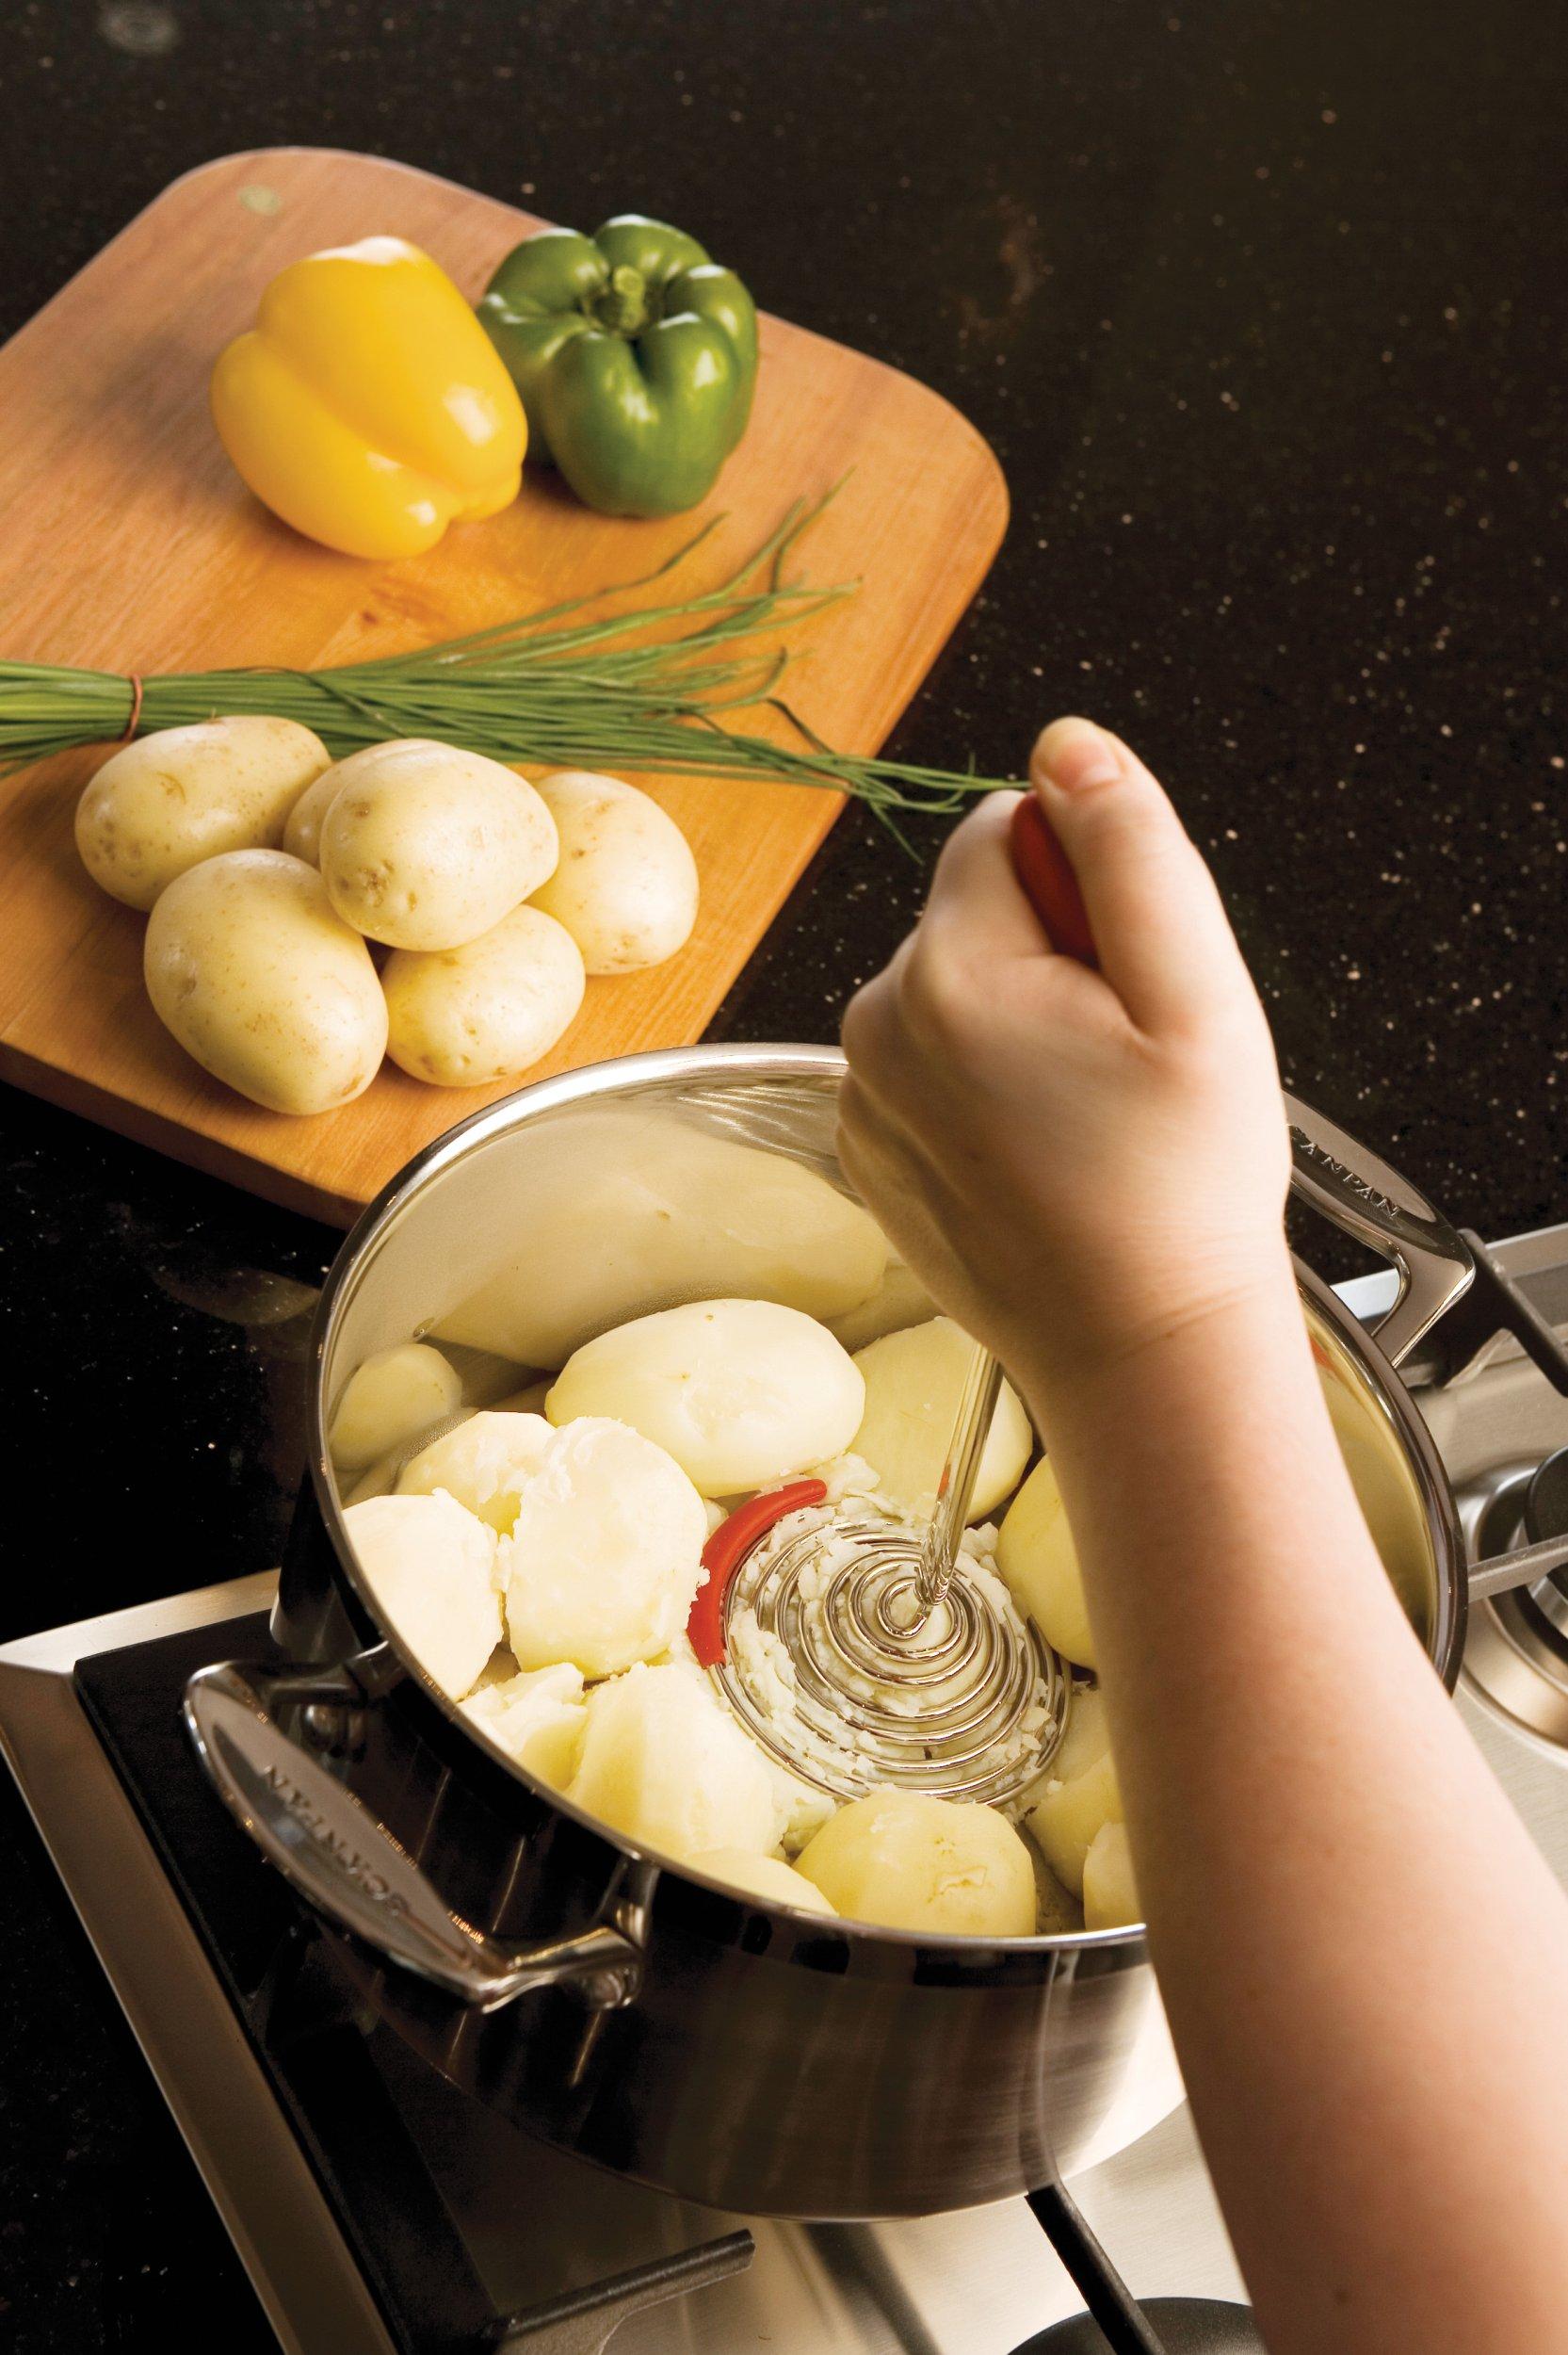 Dreamfarm Smood - One-Press Spring Coil Potato Masher with Silicone Pot Scraper (Green) by Dreamfarm